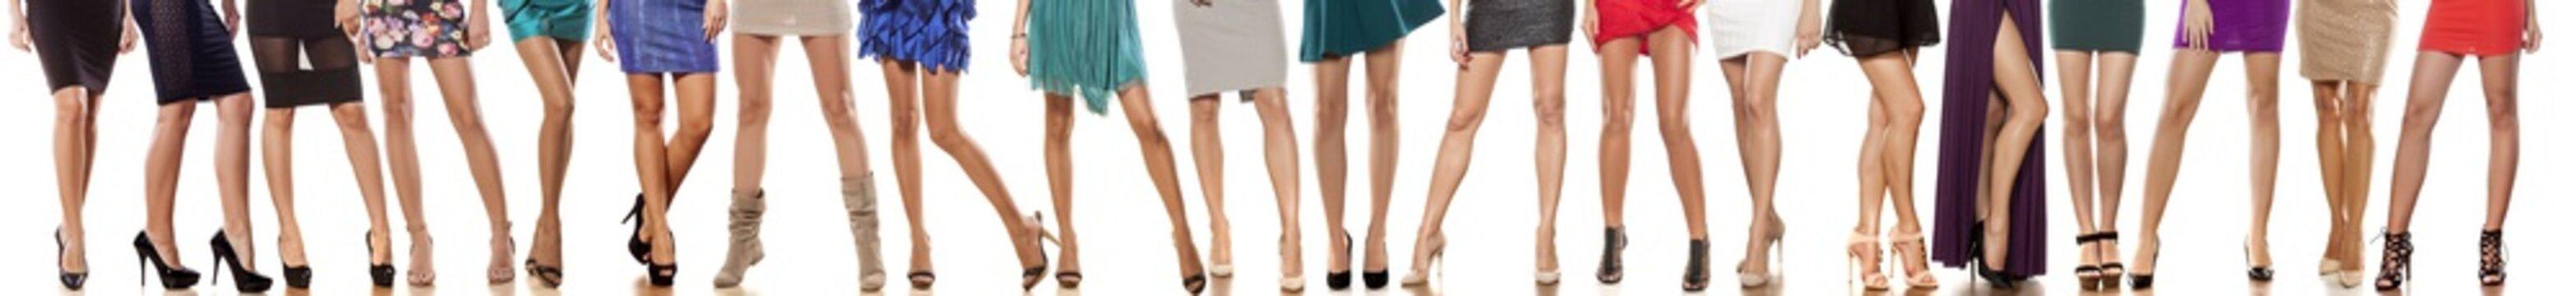 collage of female legs in short dresses